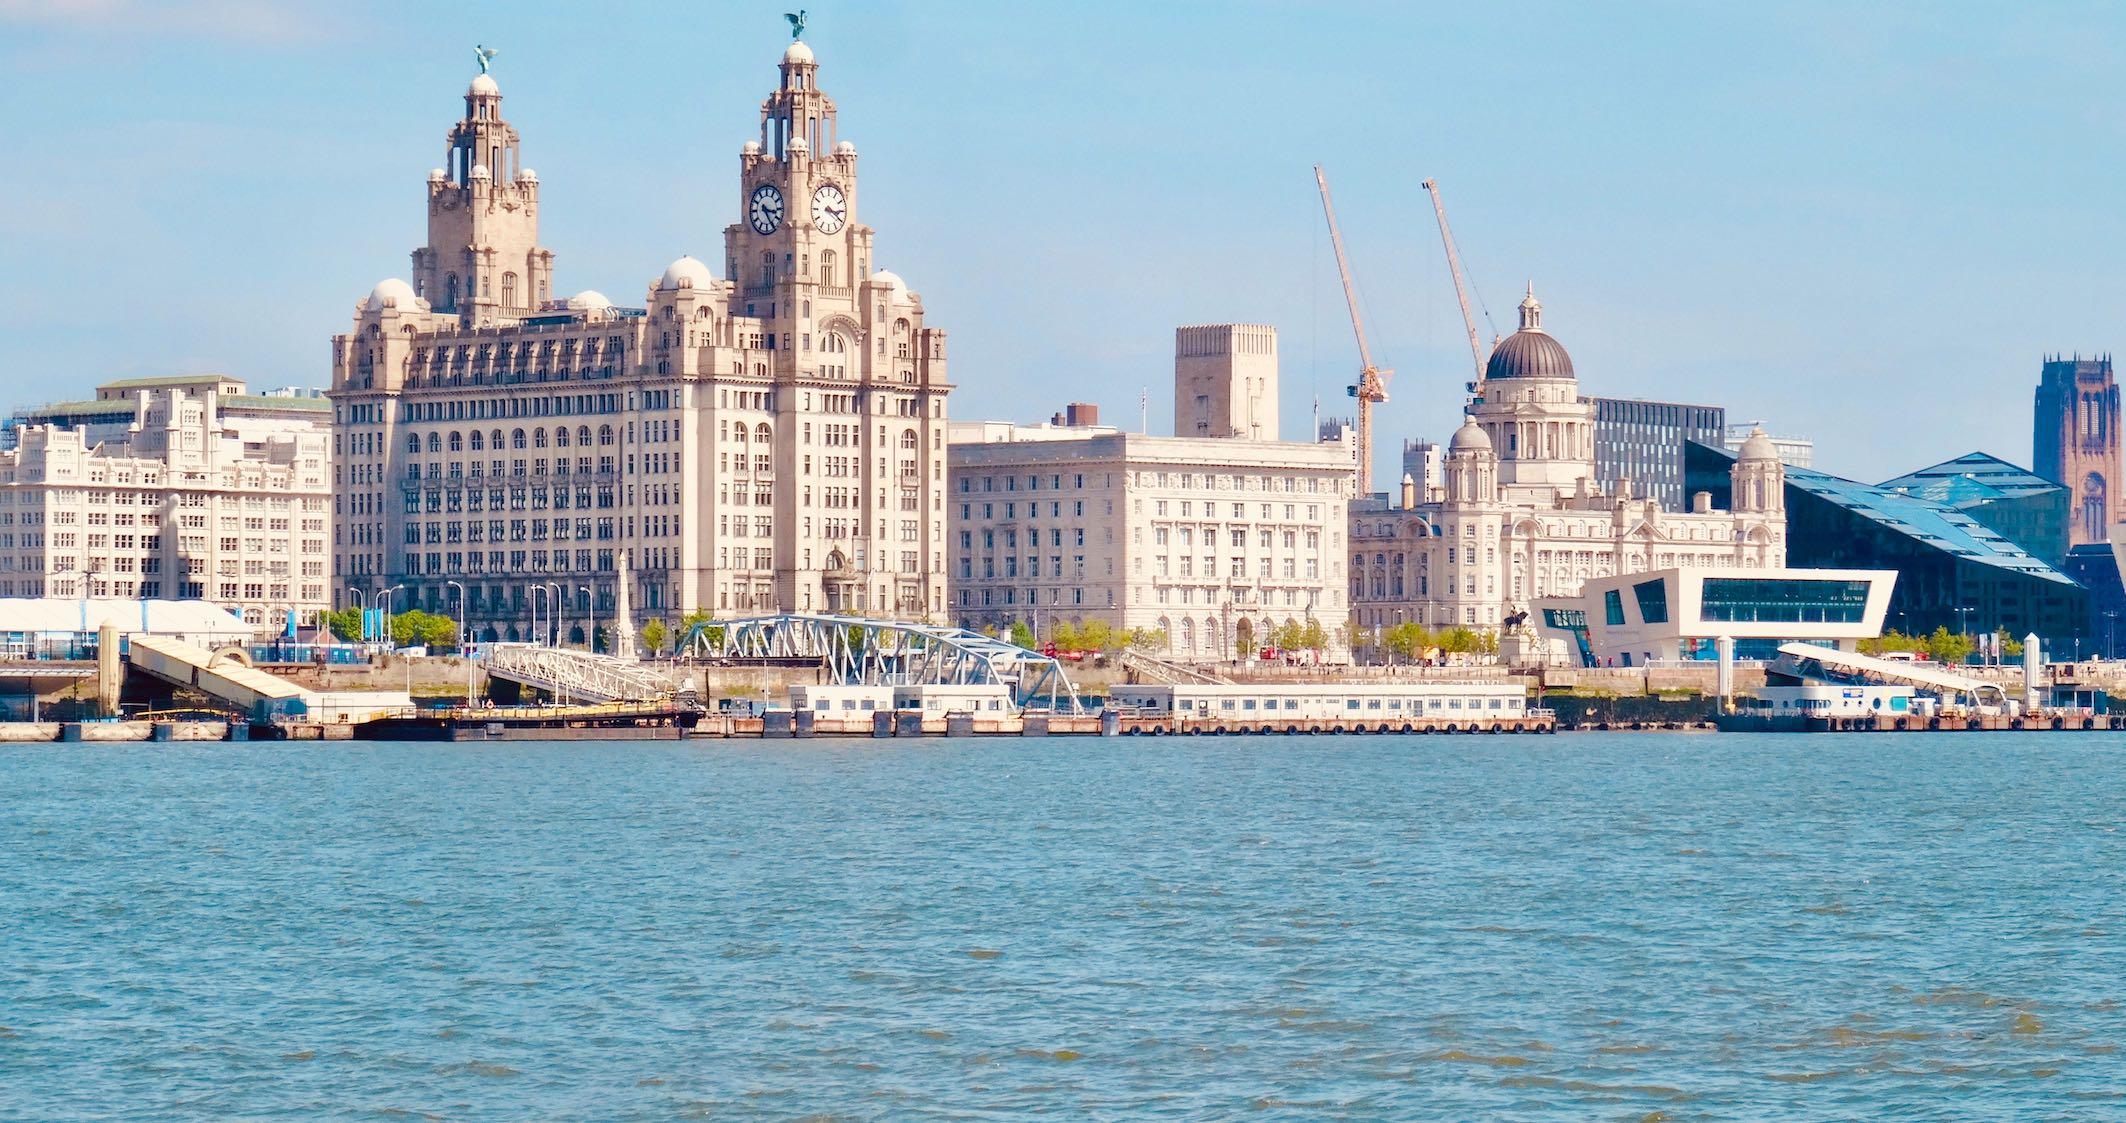 Royal Liver Building Liverpool.